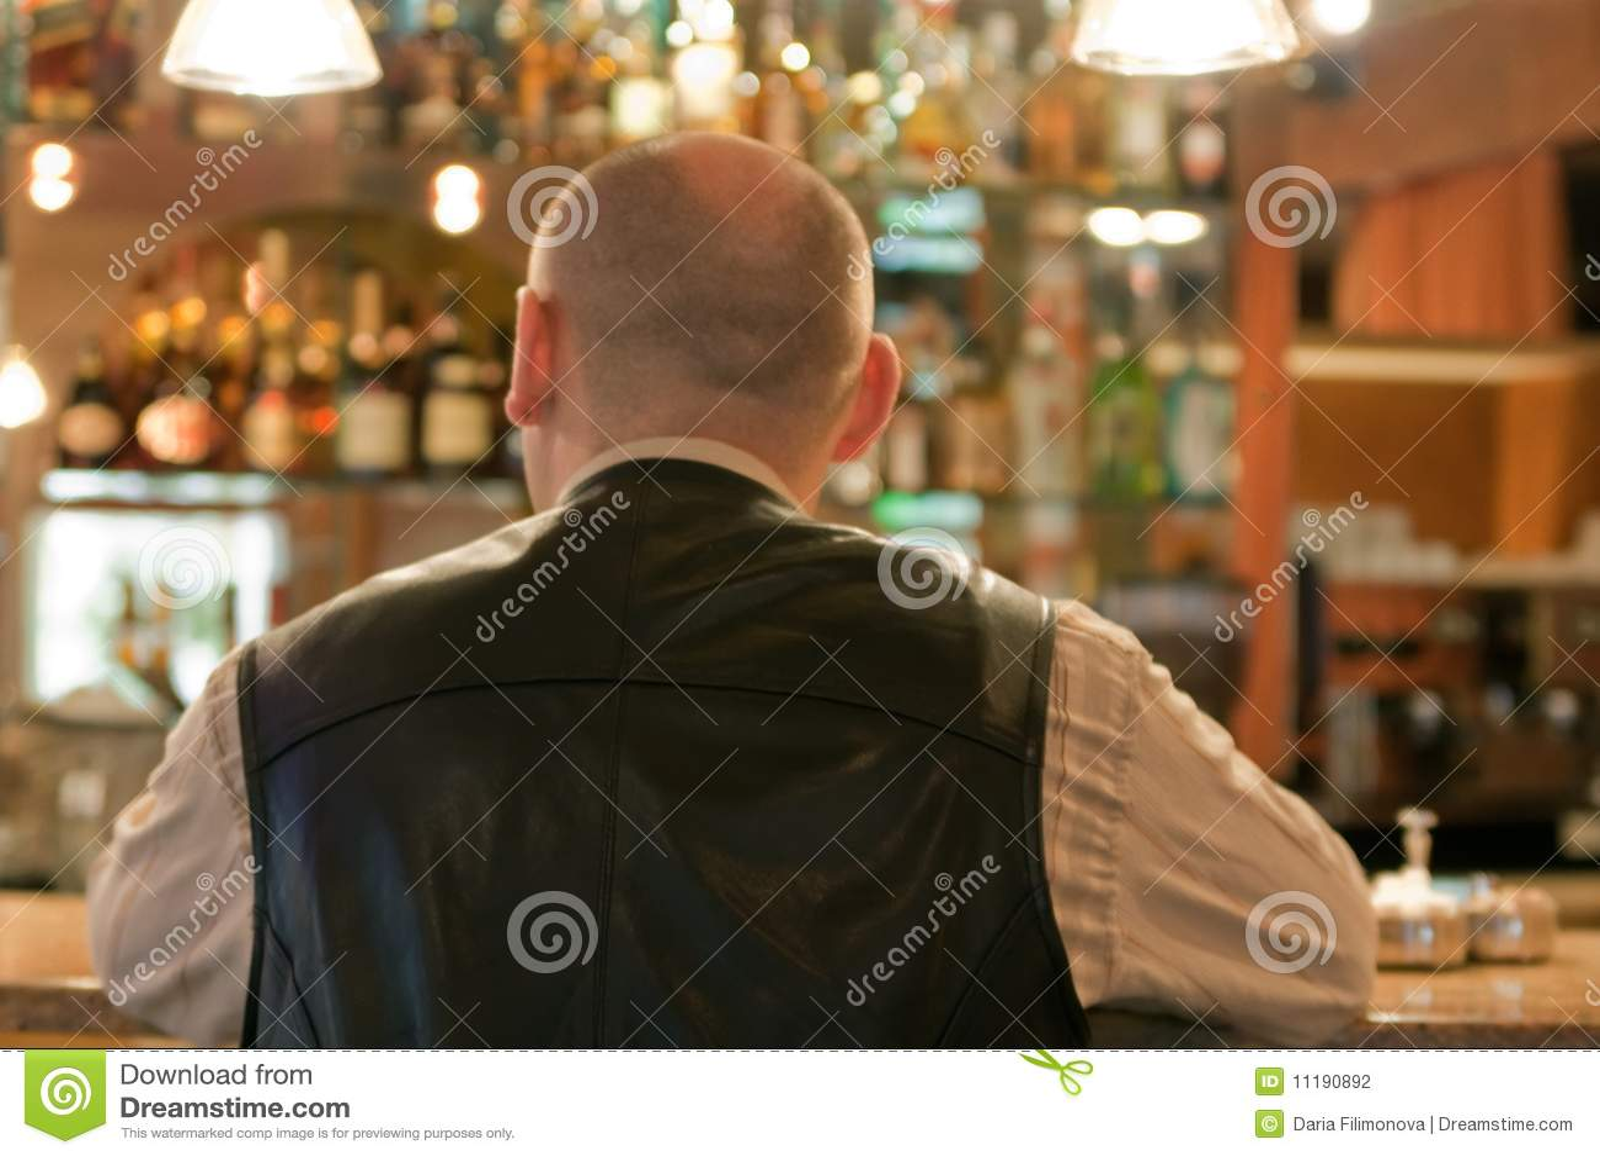 Adult men in coffee room